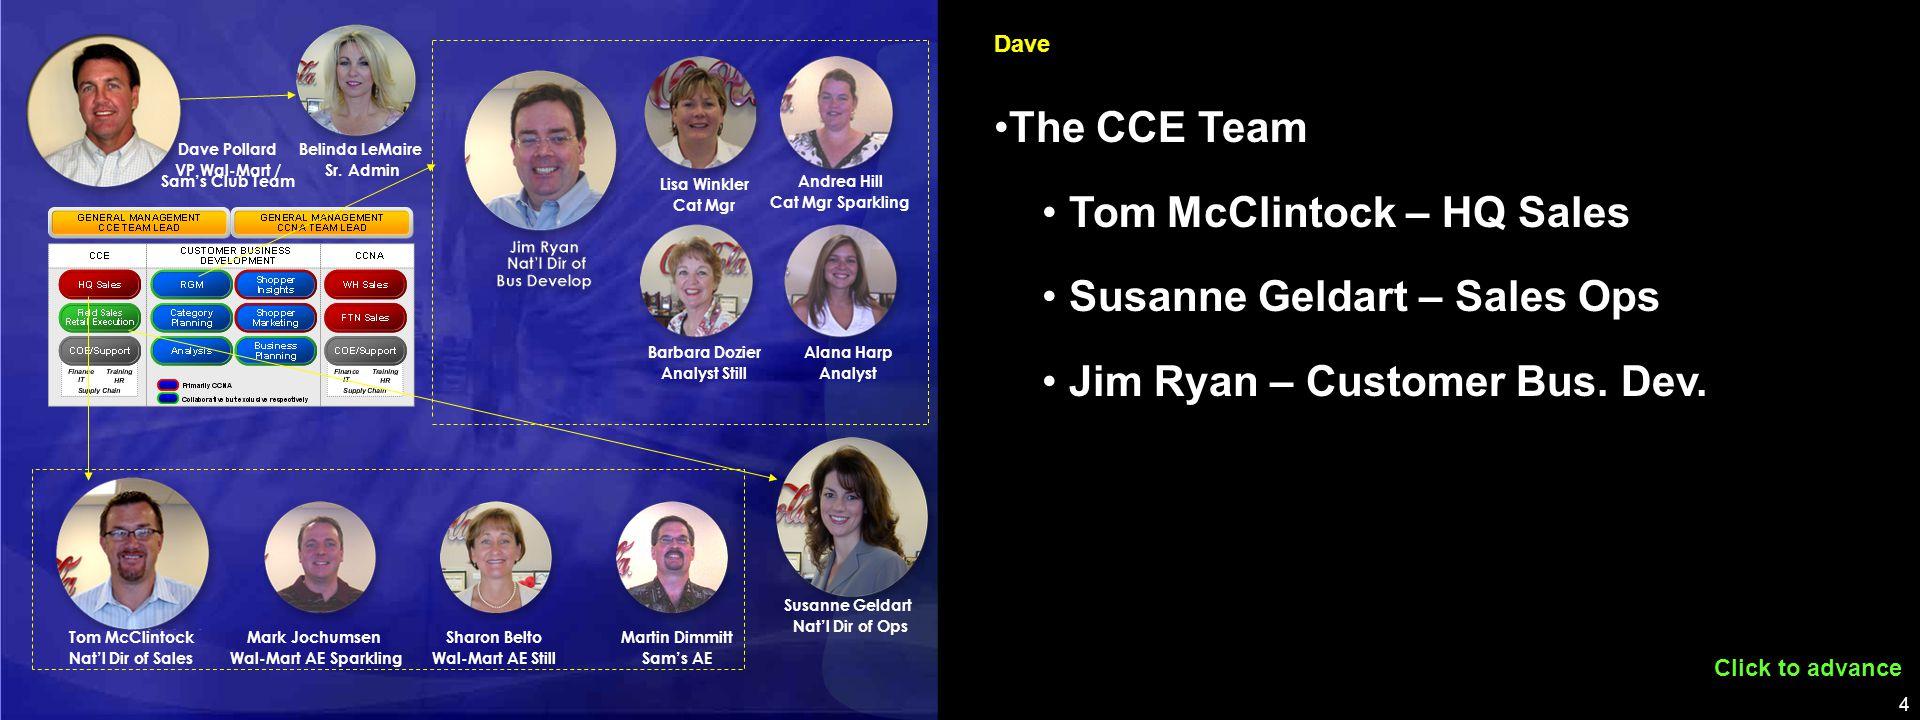 5 Bill Ryan Team Lead Paul Kraus Sales - WMT Thuc Tran Sales - Sams Steve Nowlin Cat.